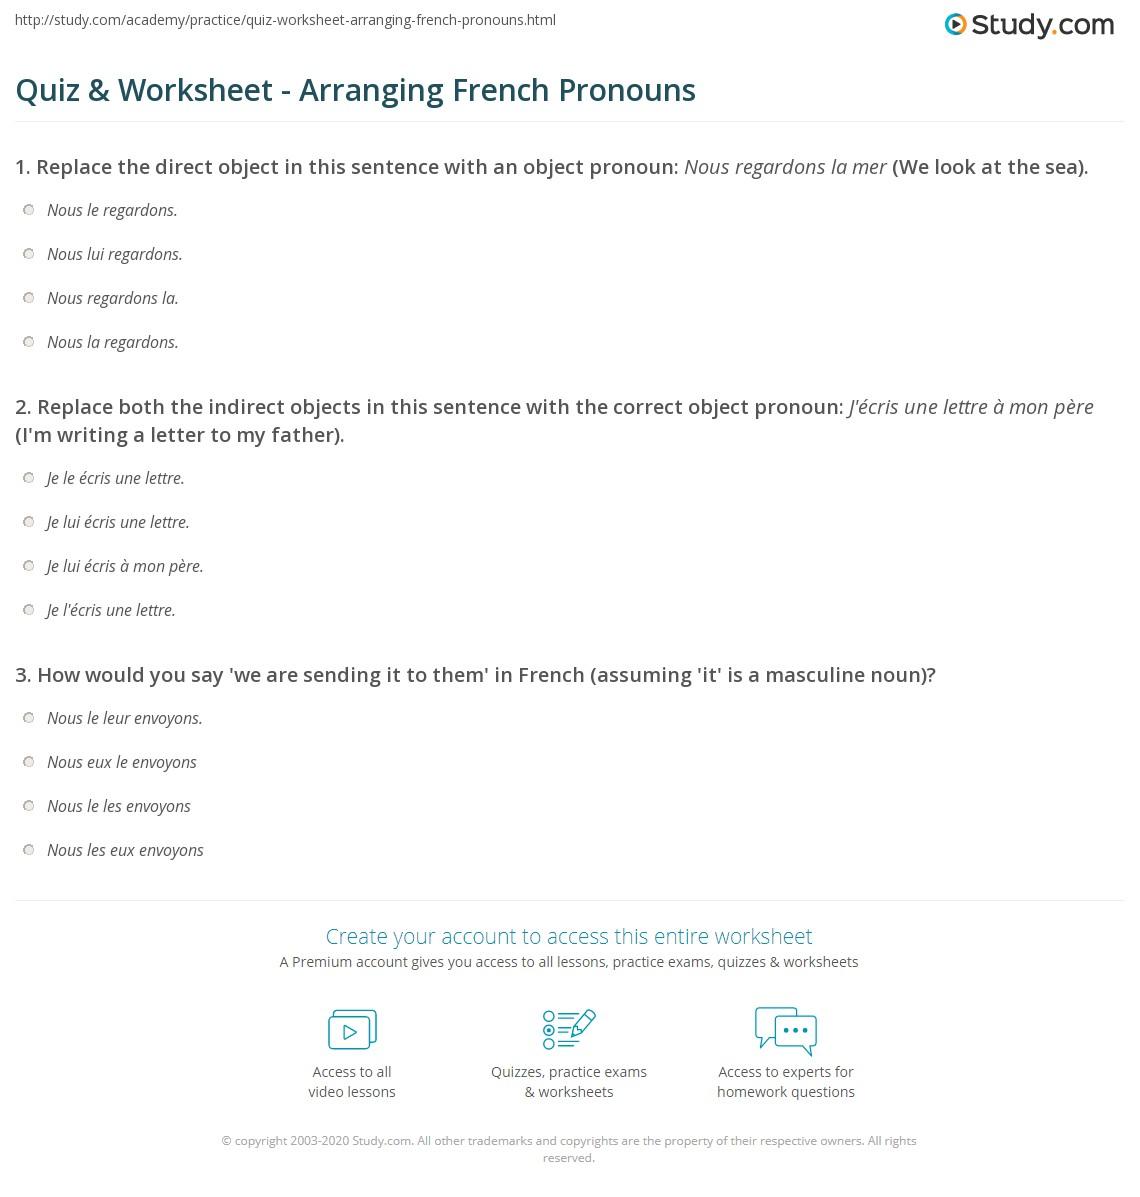 Quiz & Worksheet - Arranging French Pronouns   Study.com